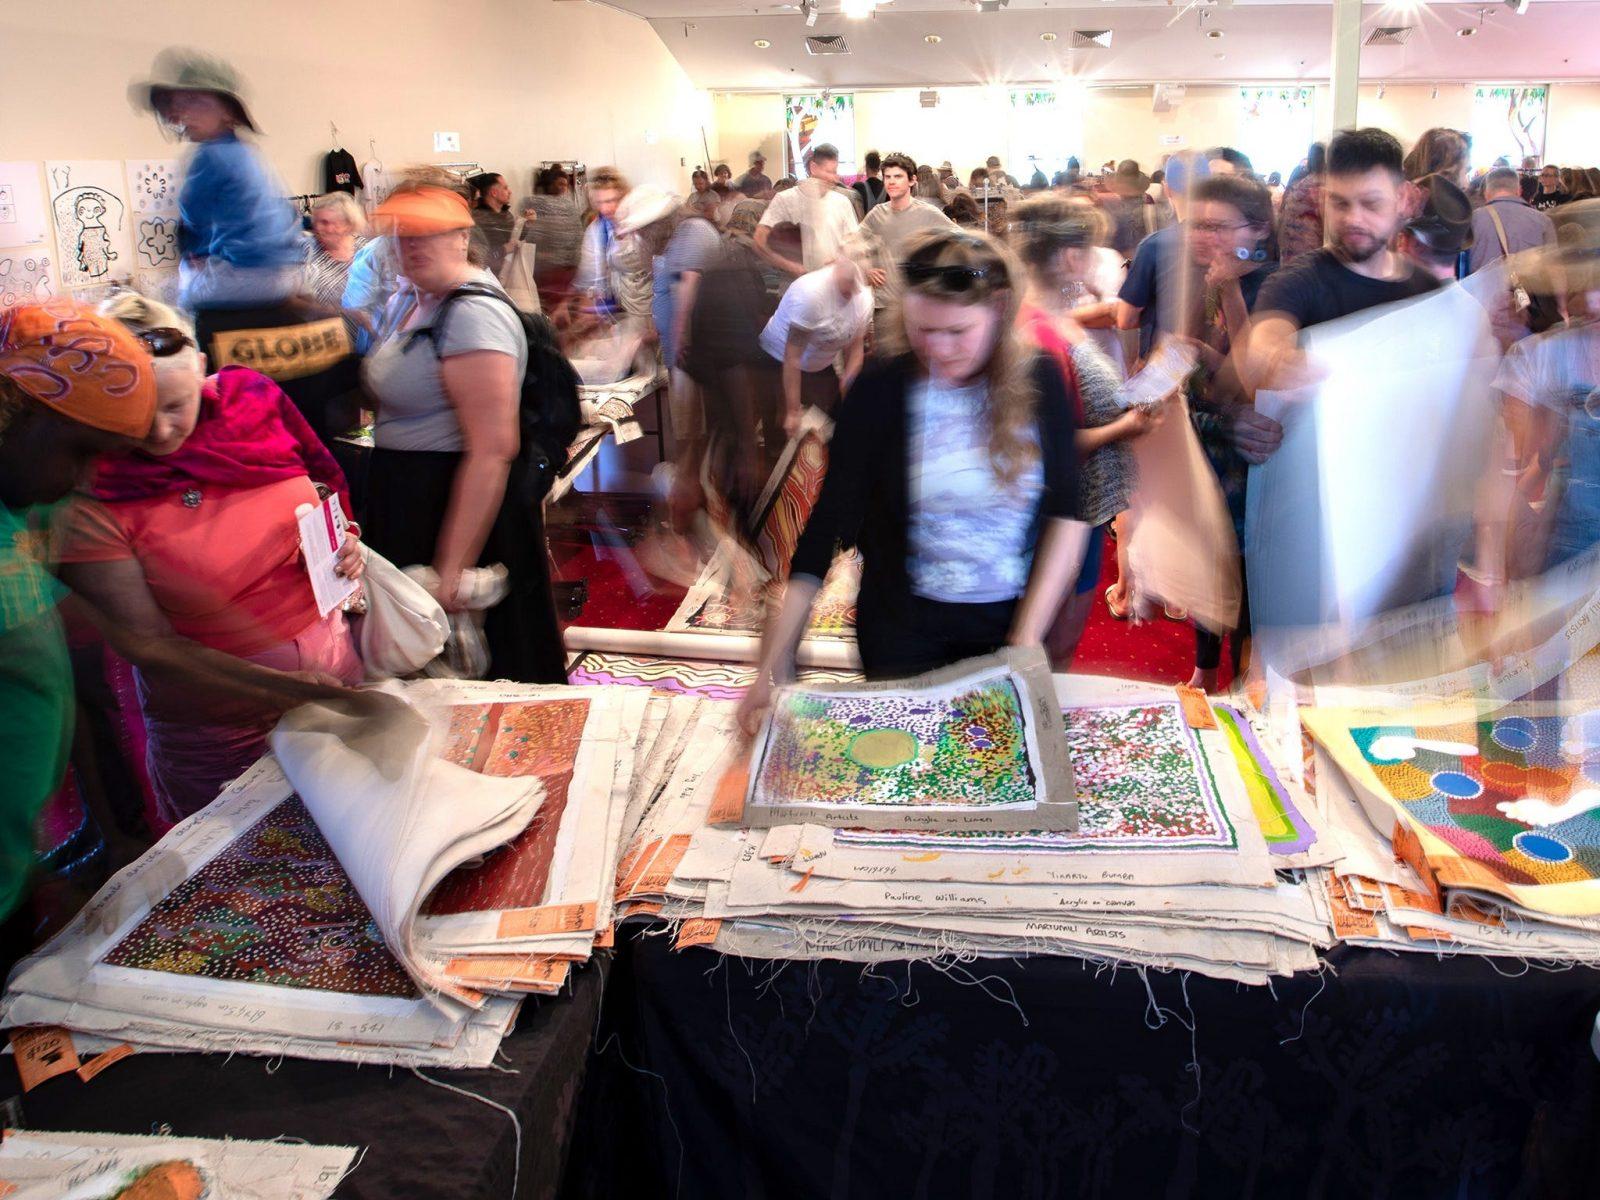 crowds buying Aboriginal art work at art fair